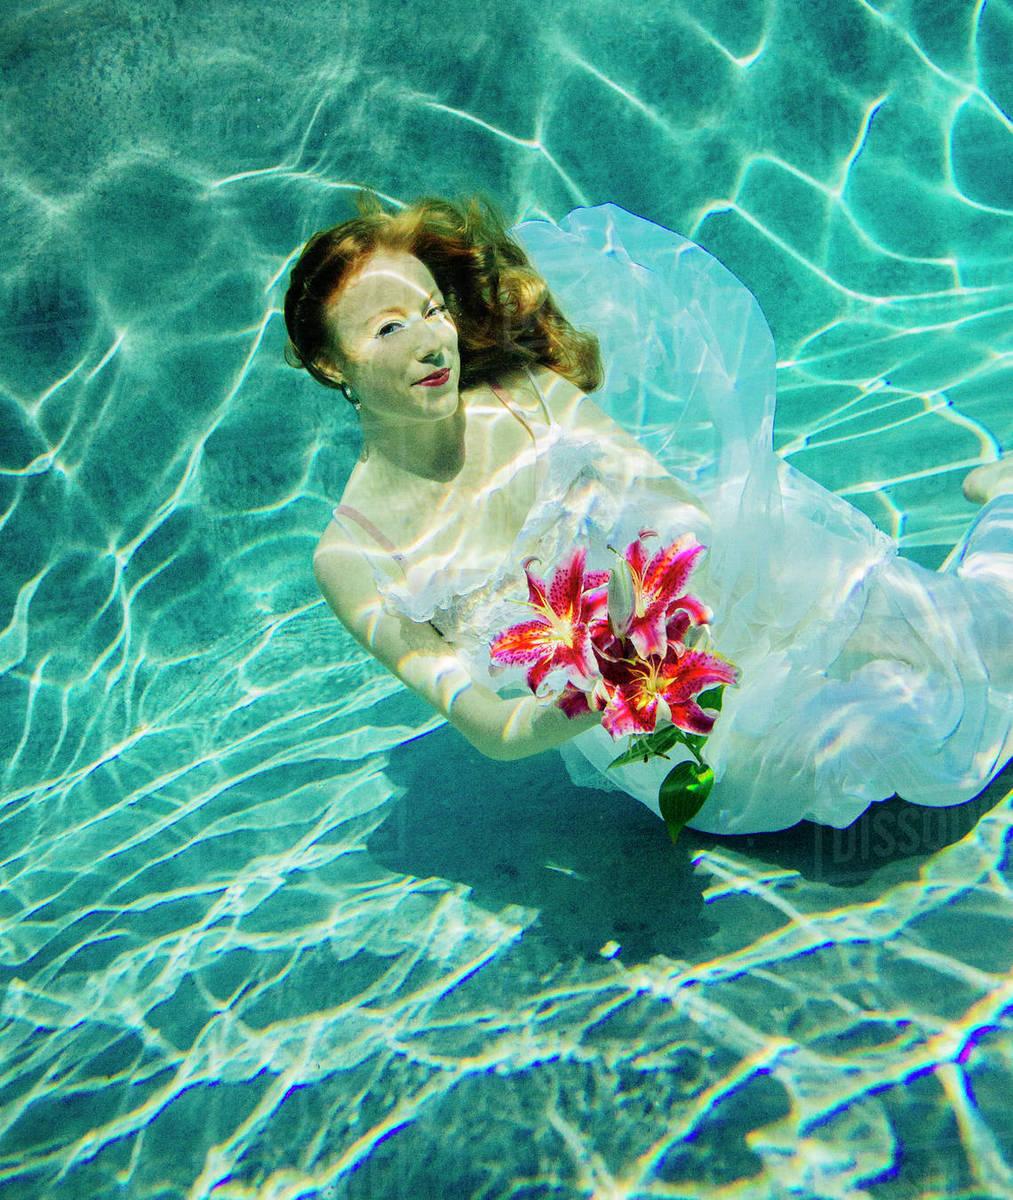 ad11f322fe Caucasian woman wearing dress holding bouquet of flowers underwater ...